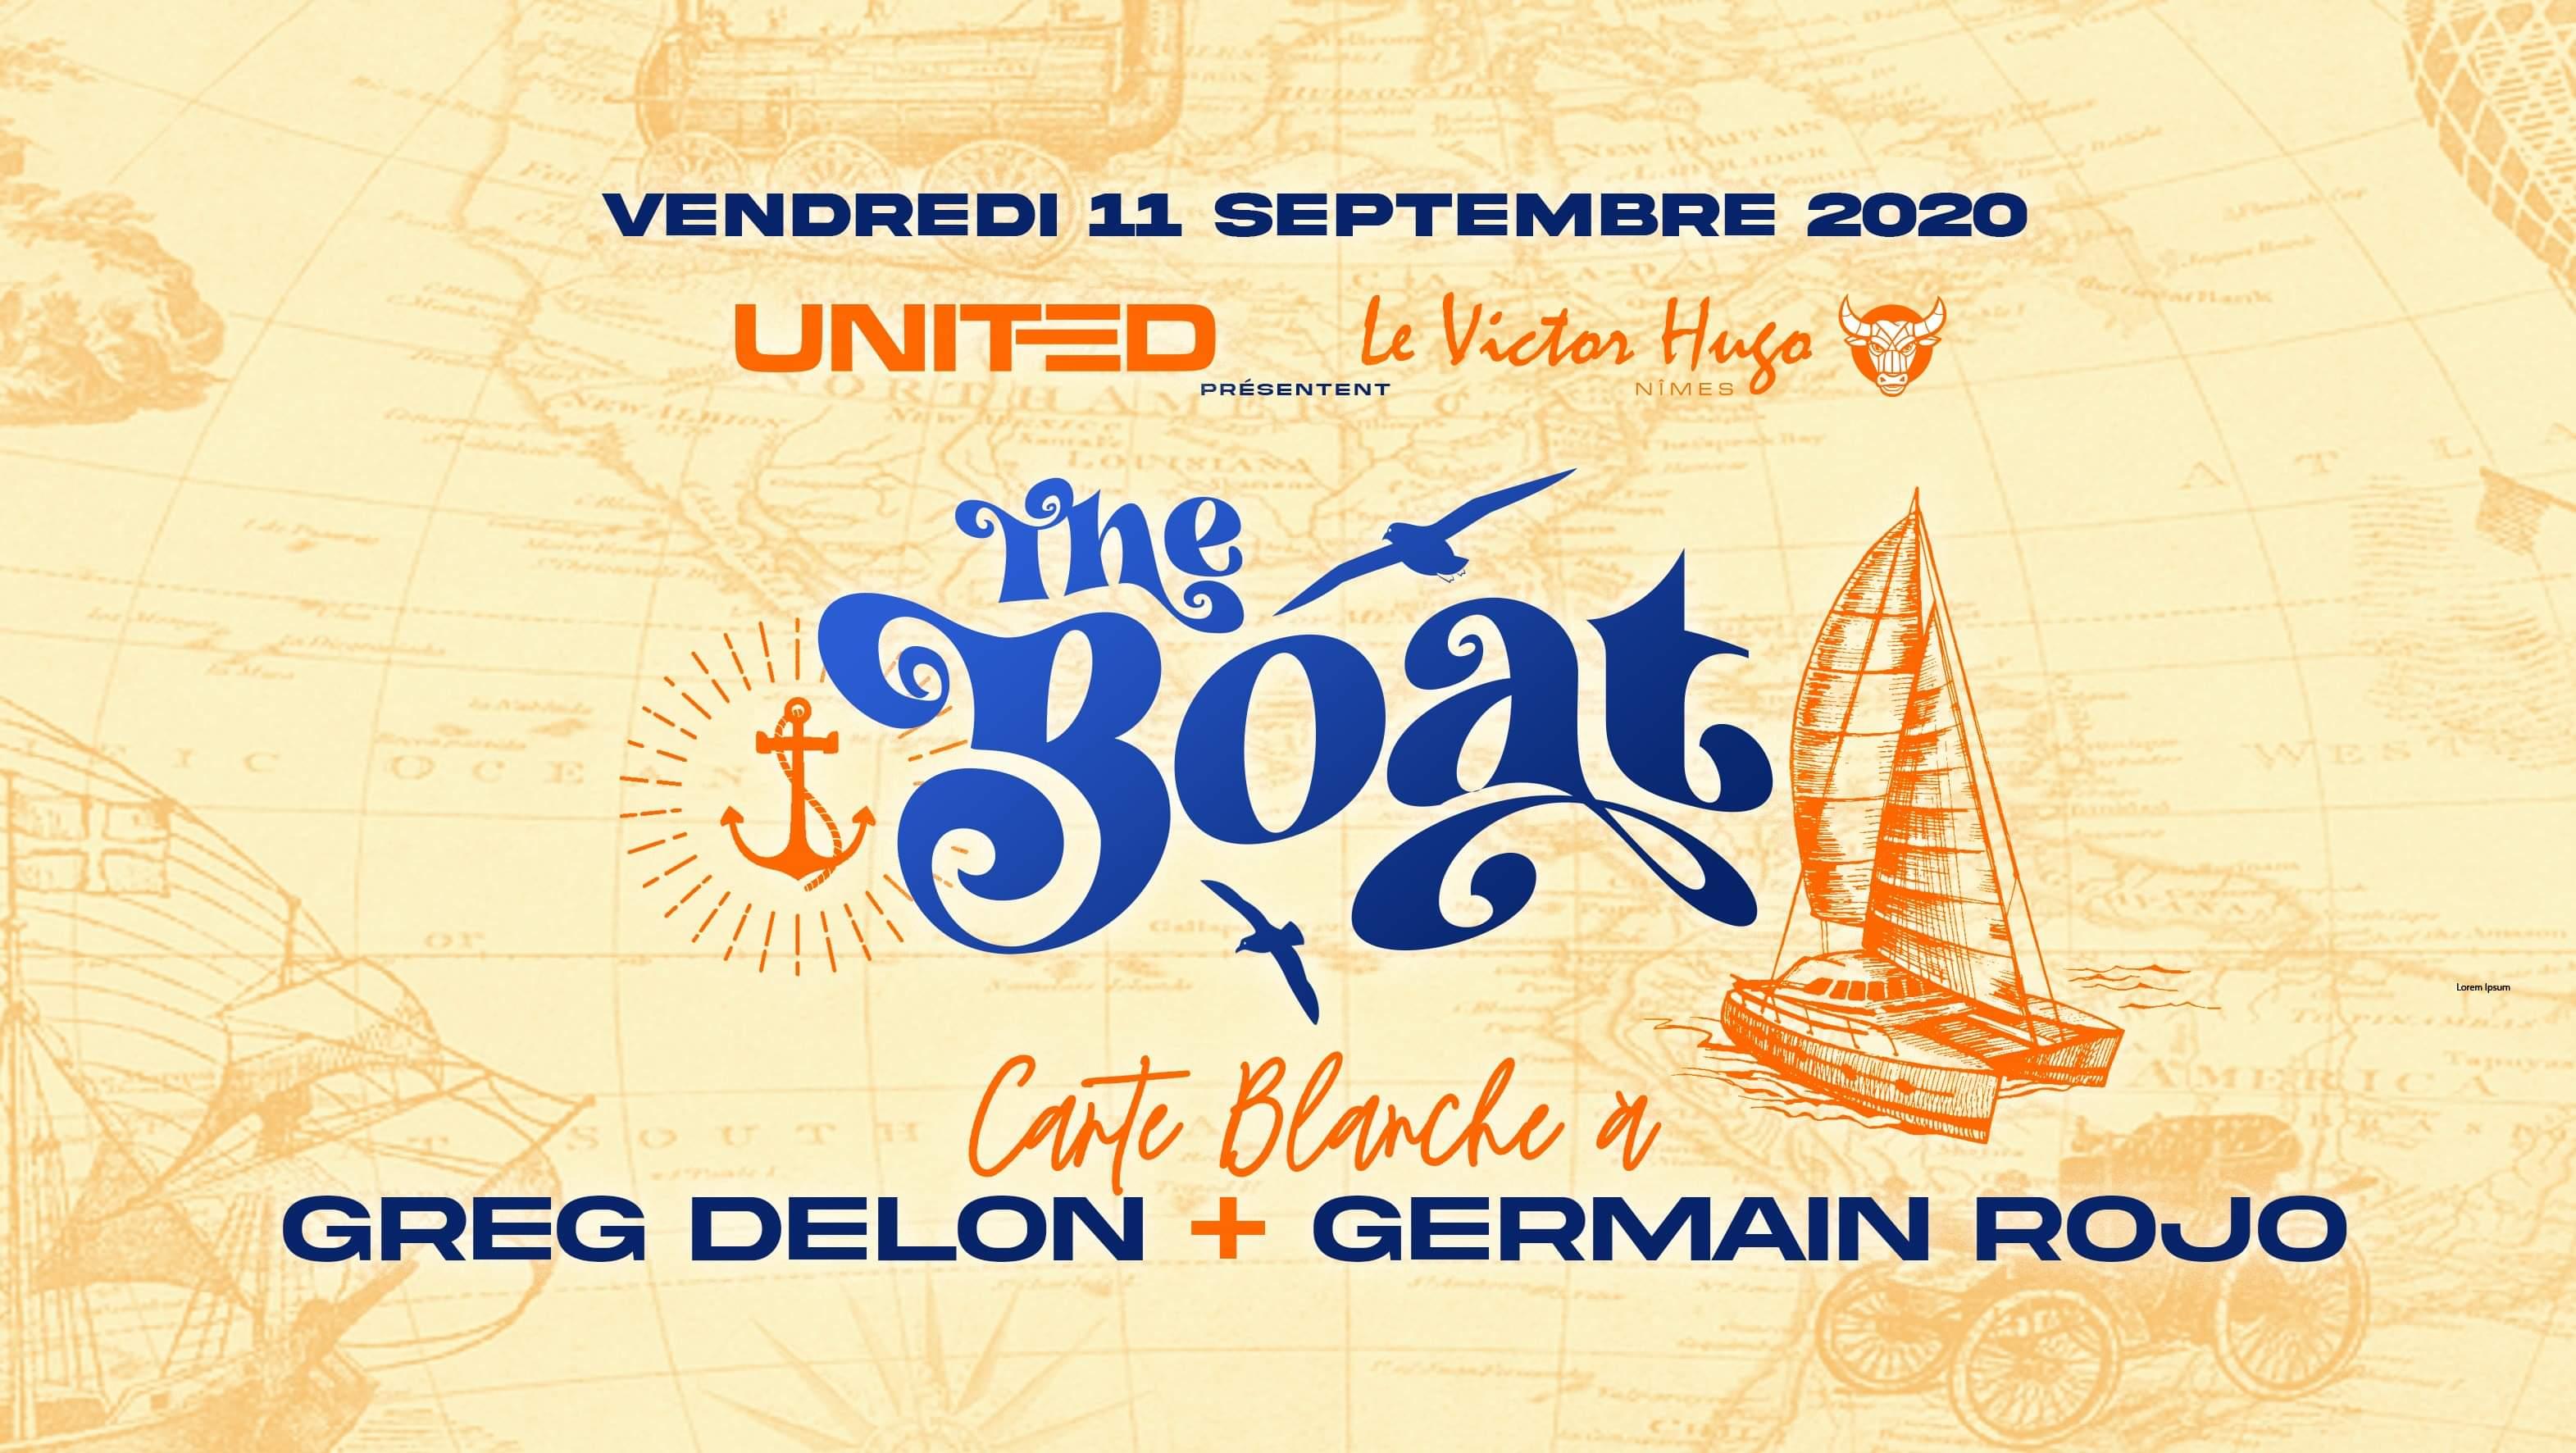 The BOAT y United : carte blanche à Greg Delon & Germain Rojo